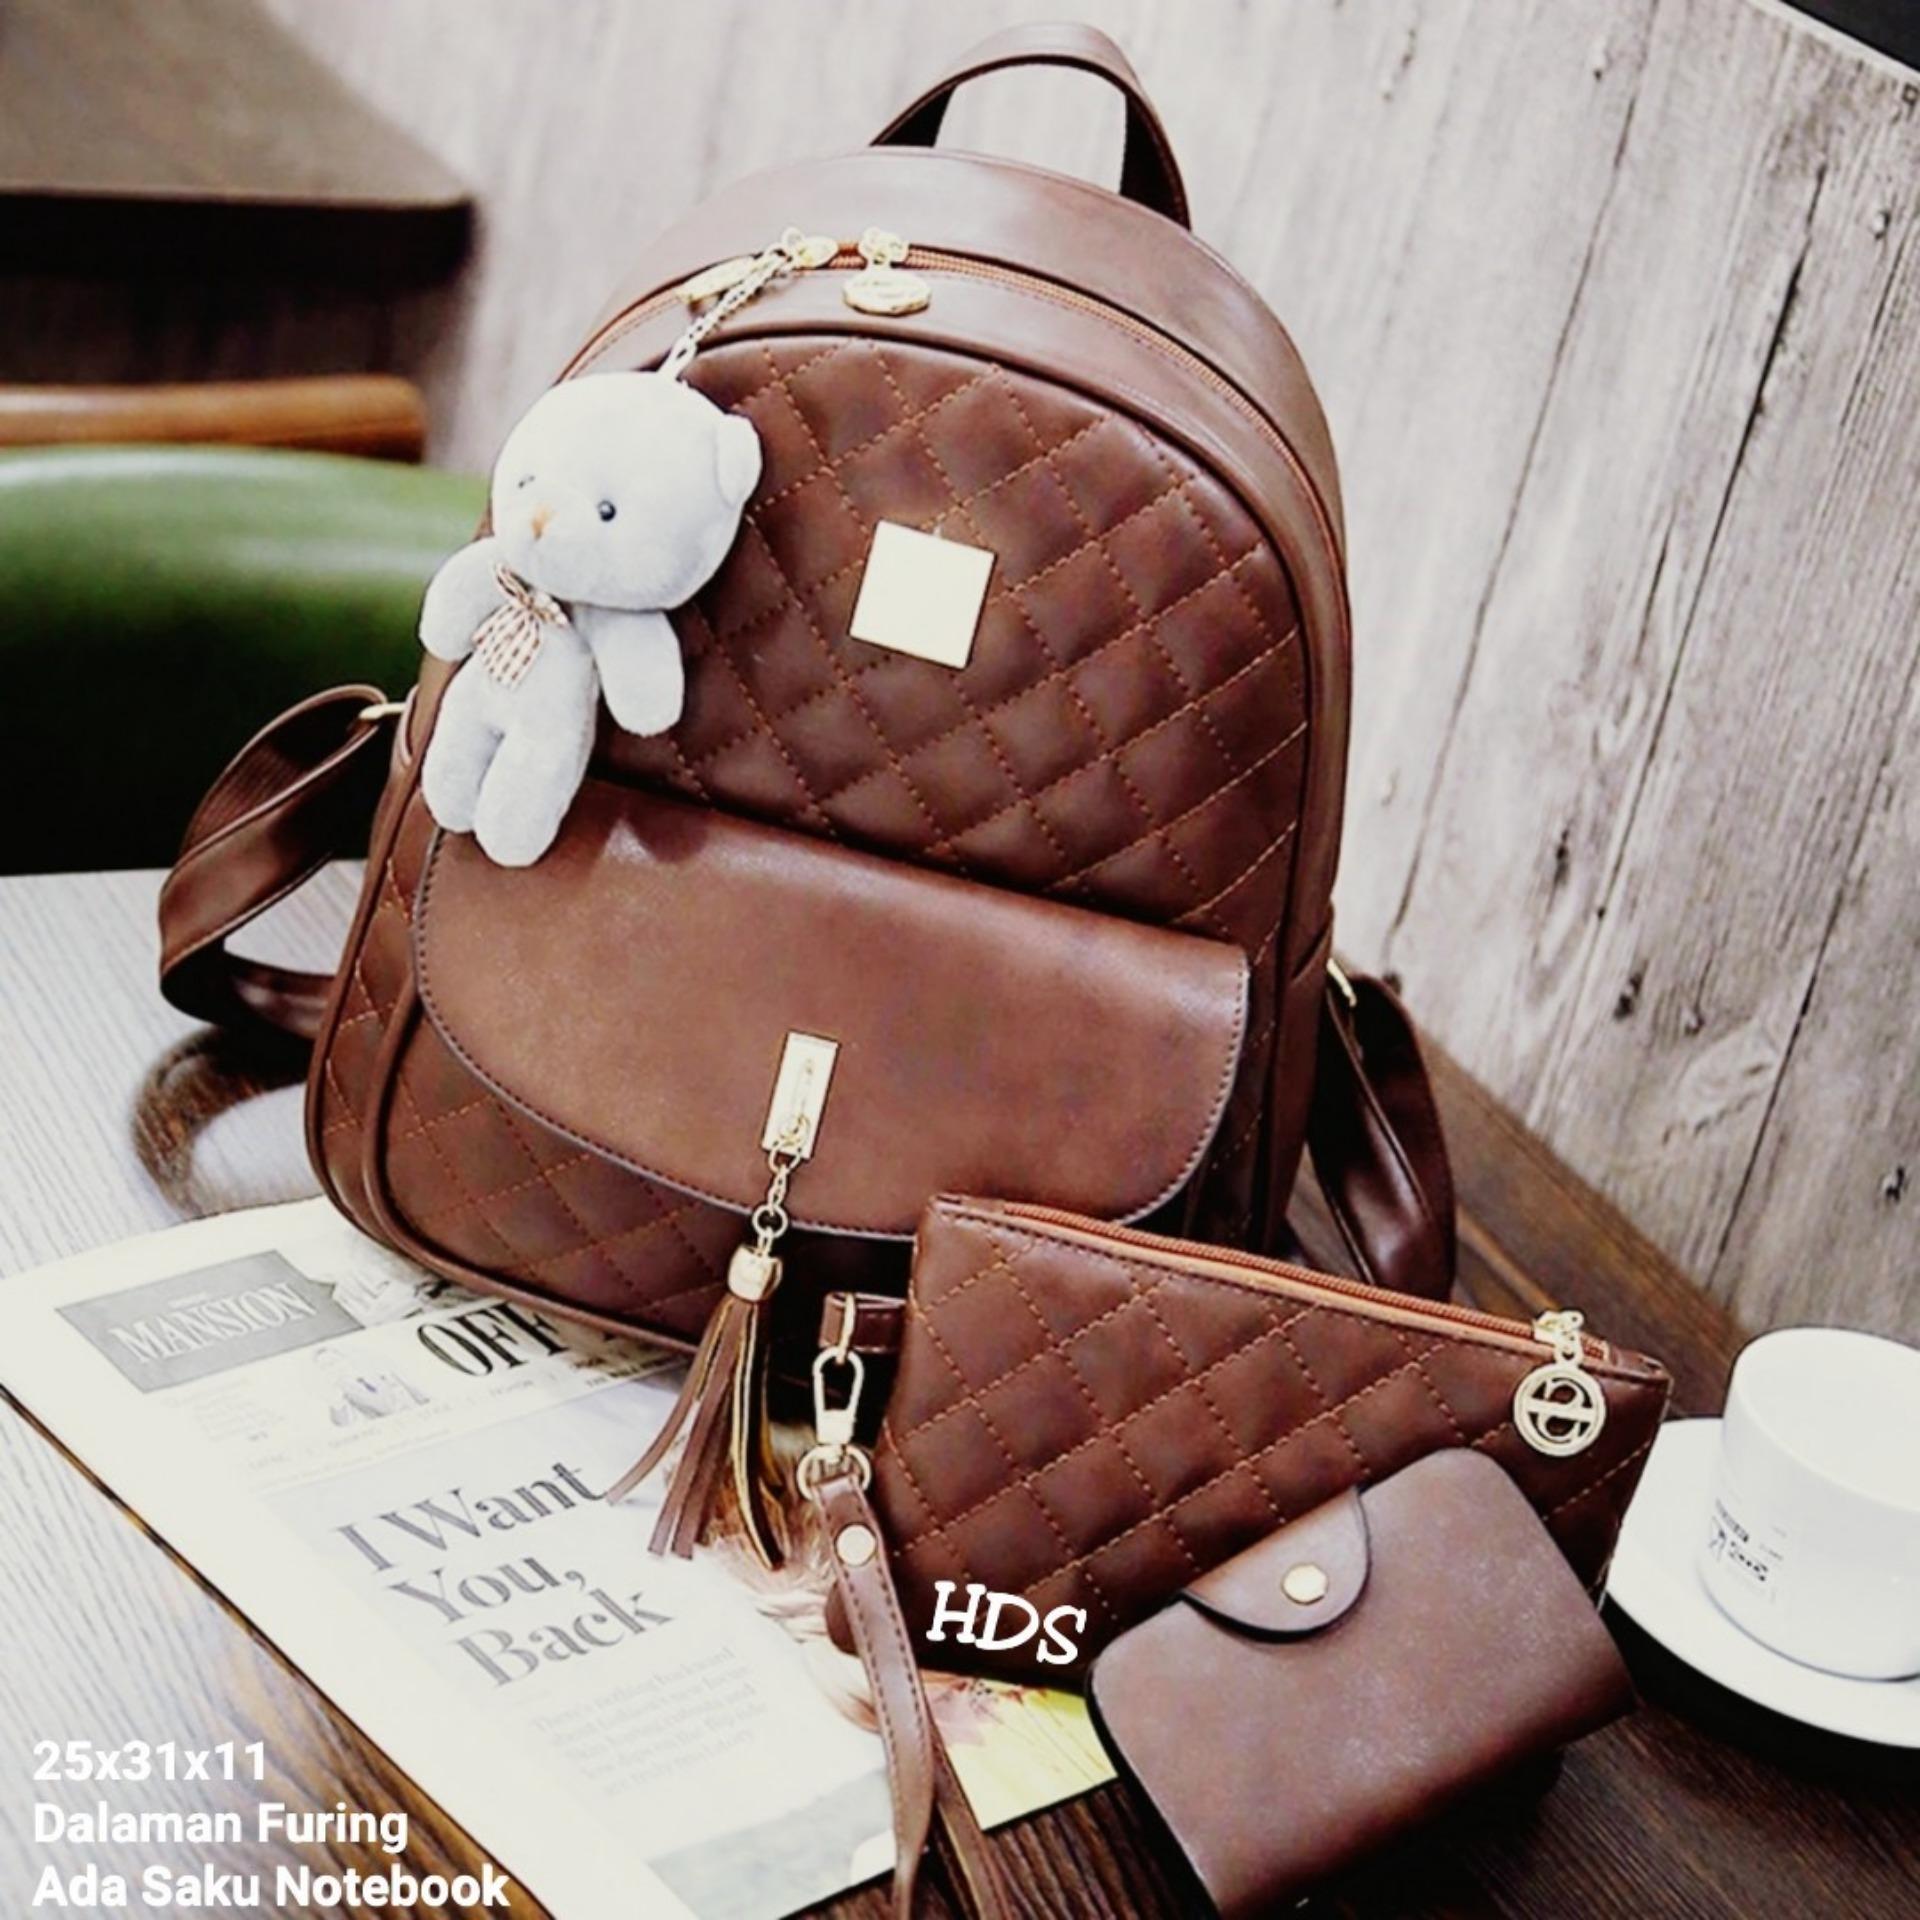 Beli Murah Backpack Korean Style Embossed Tassel 3 In 1 Tas Sekolah 3in1 Ransel Pouch